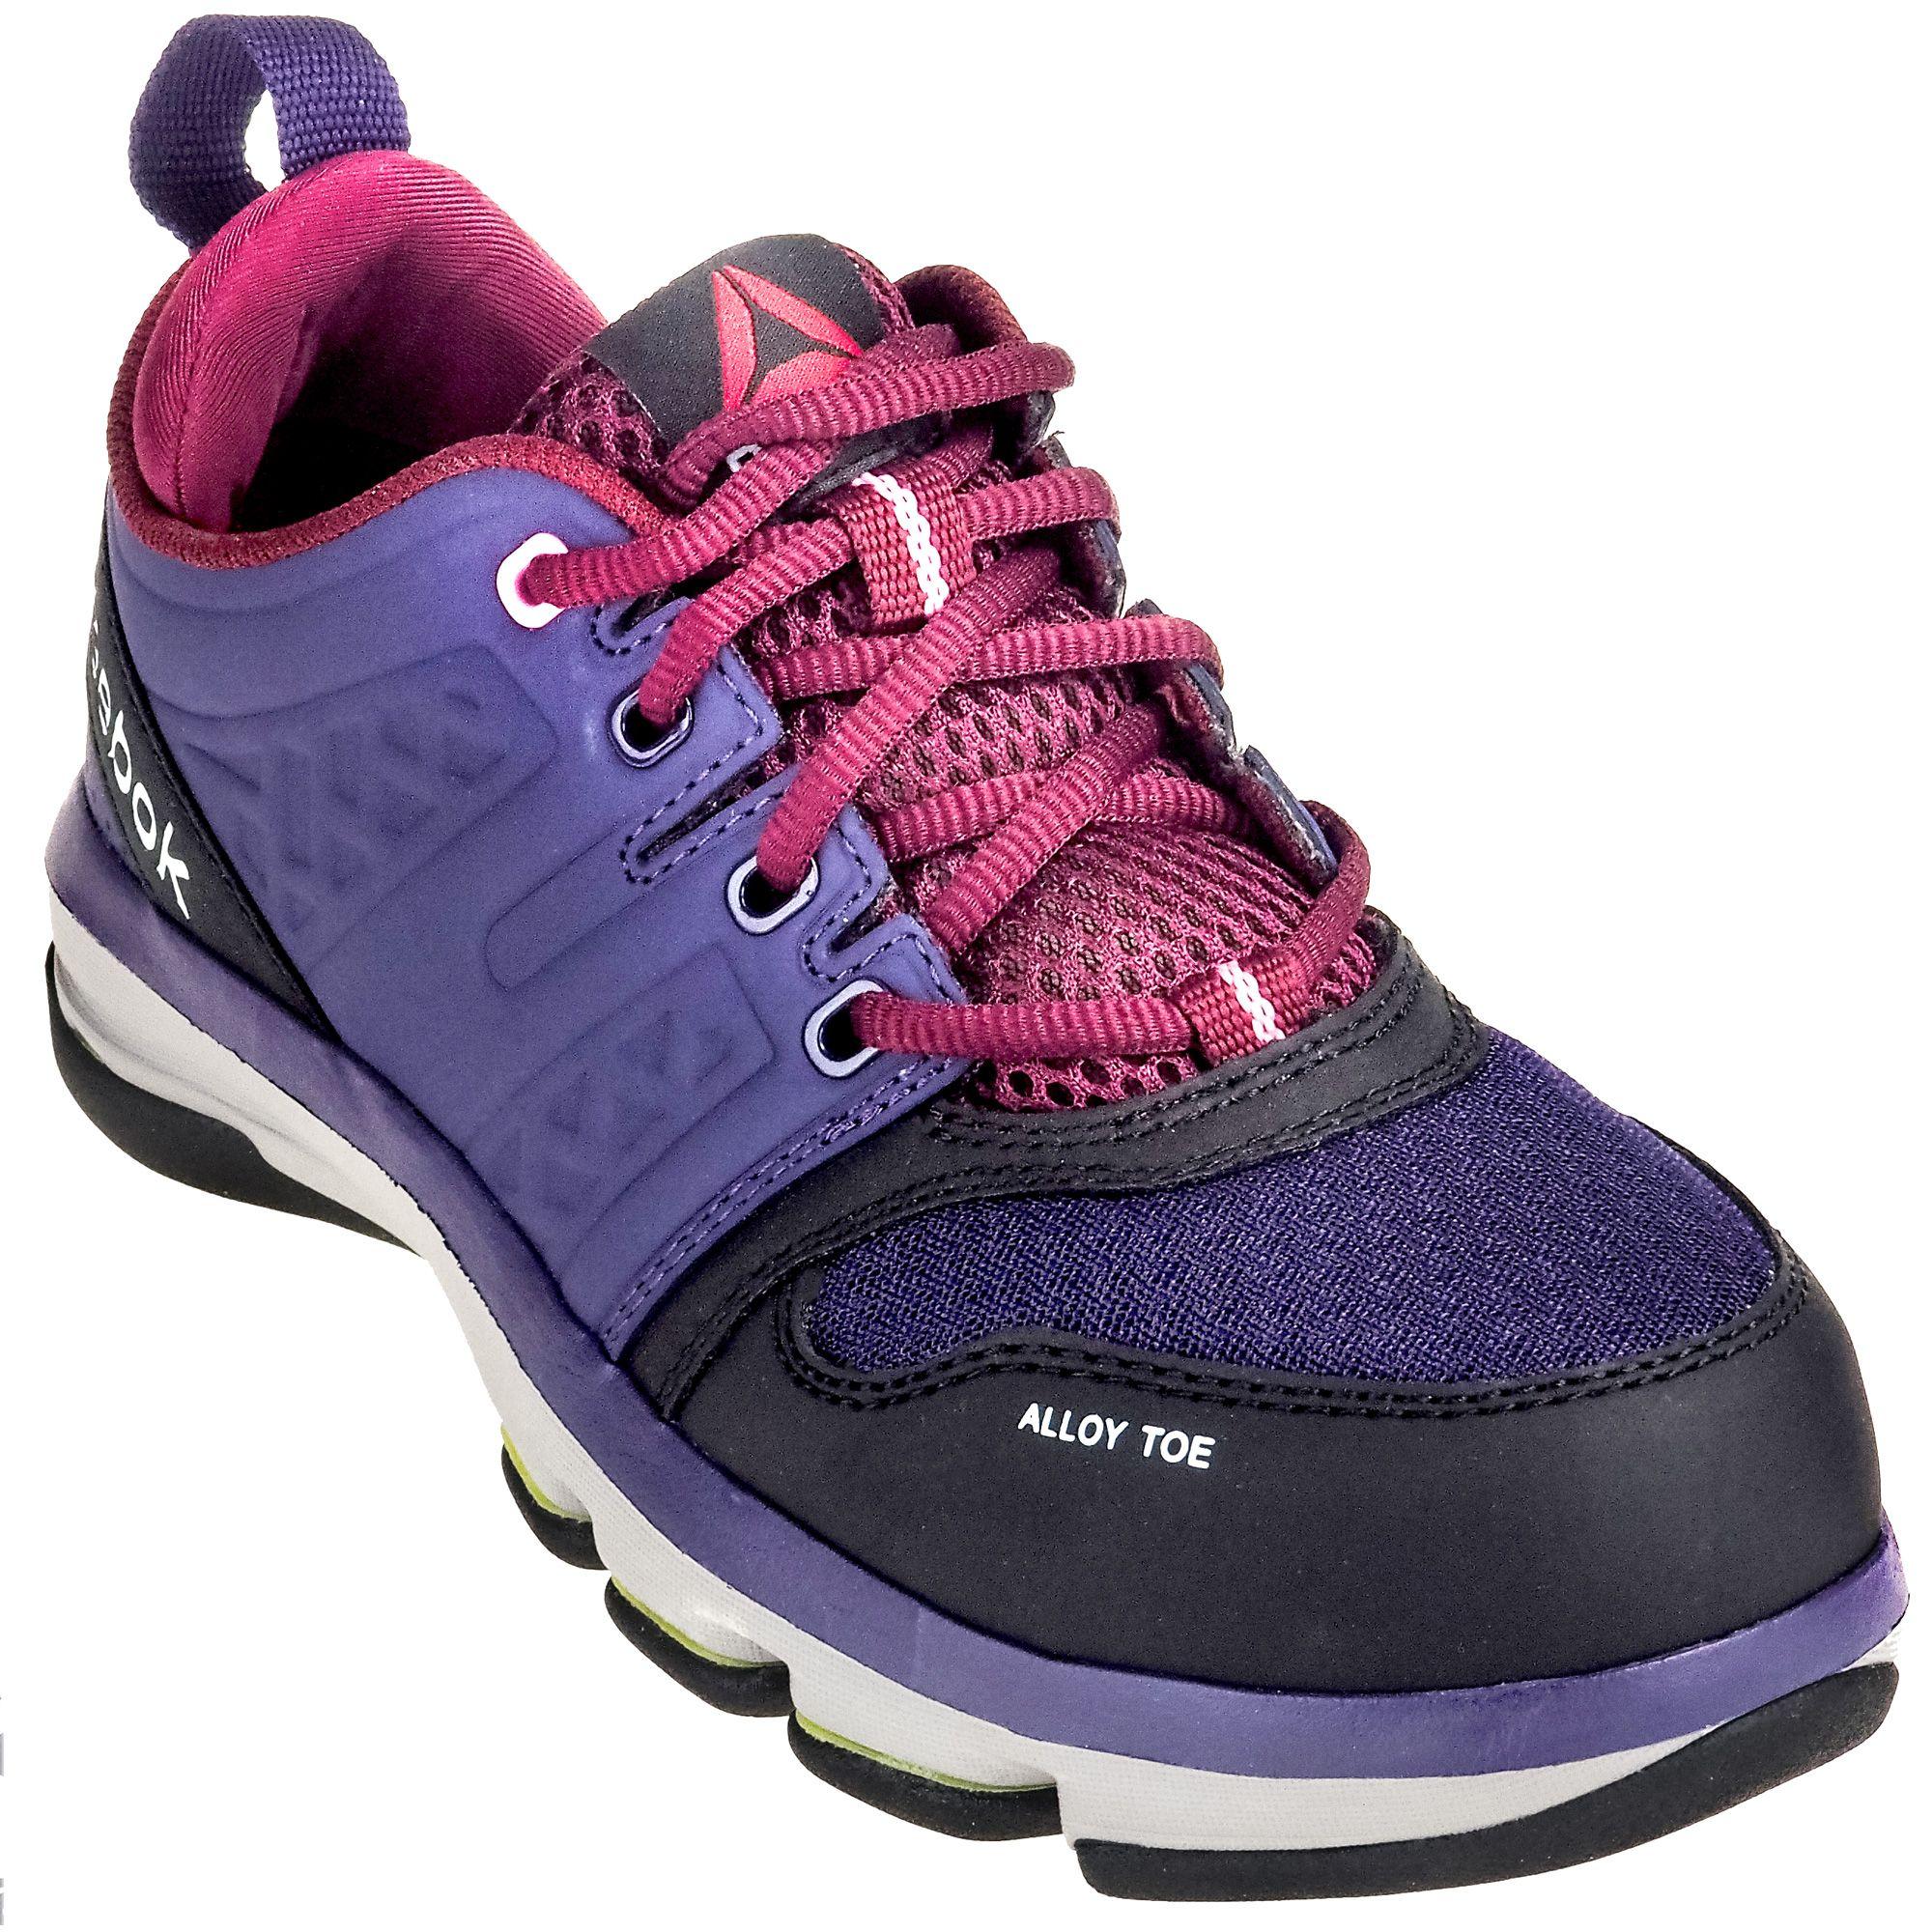 c76622709581 Reebok Women s RB360 Purple Alloy Toe ESD DMX Flex Athletic Work Shoes